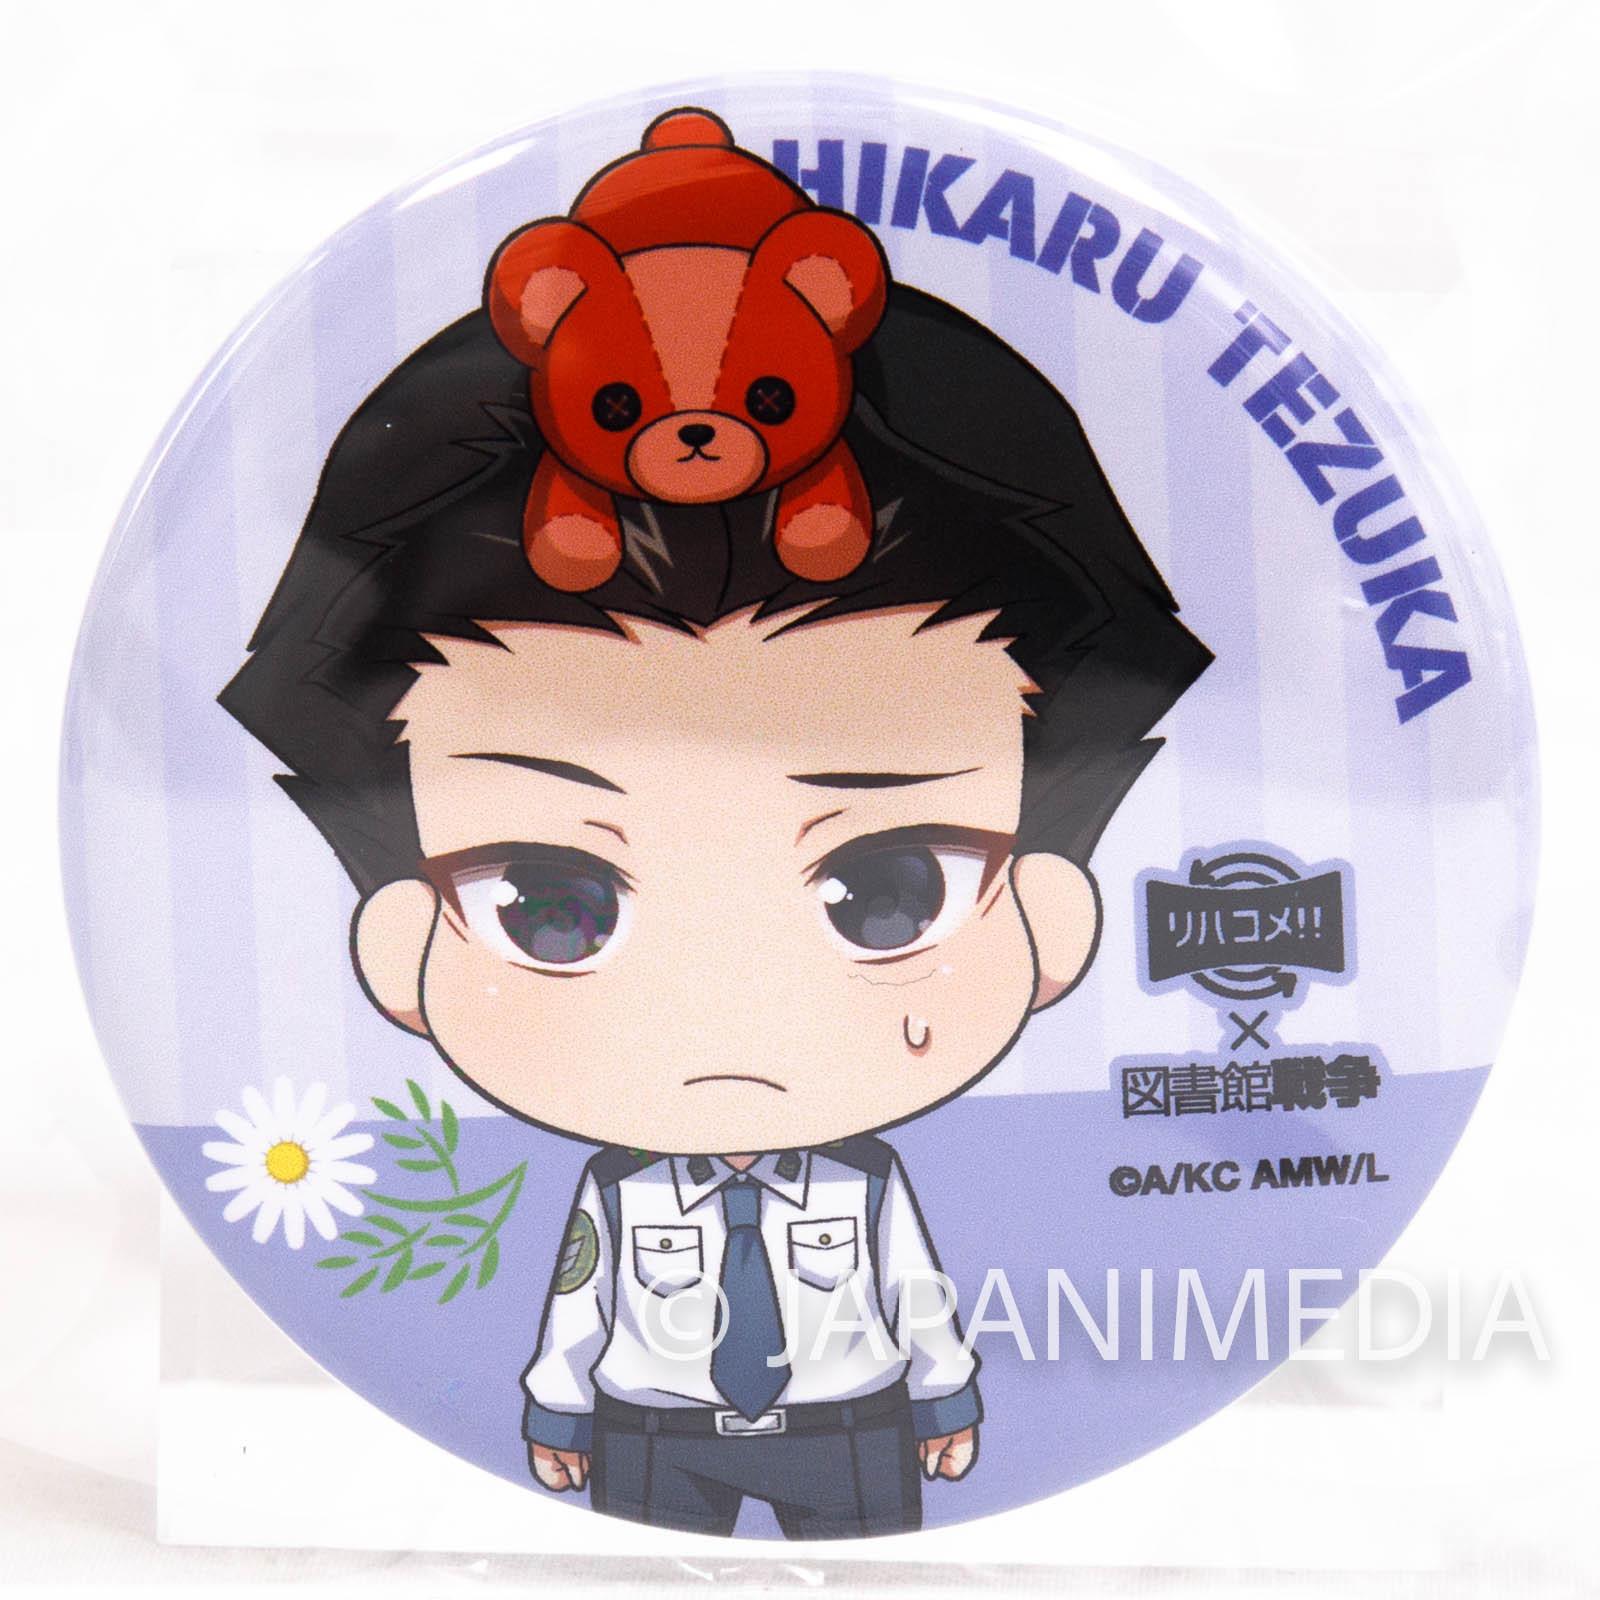 Library War x revacomme!! Hikaru Tezuka Event Button badge JAPAN ANIME